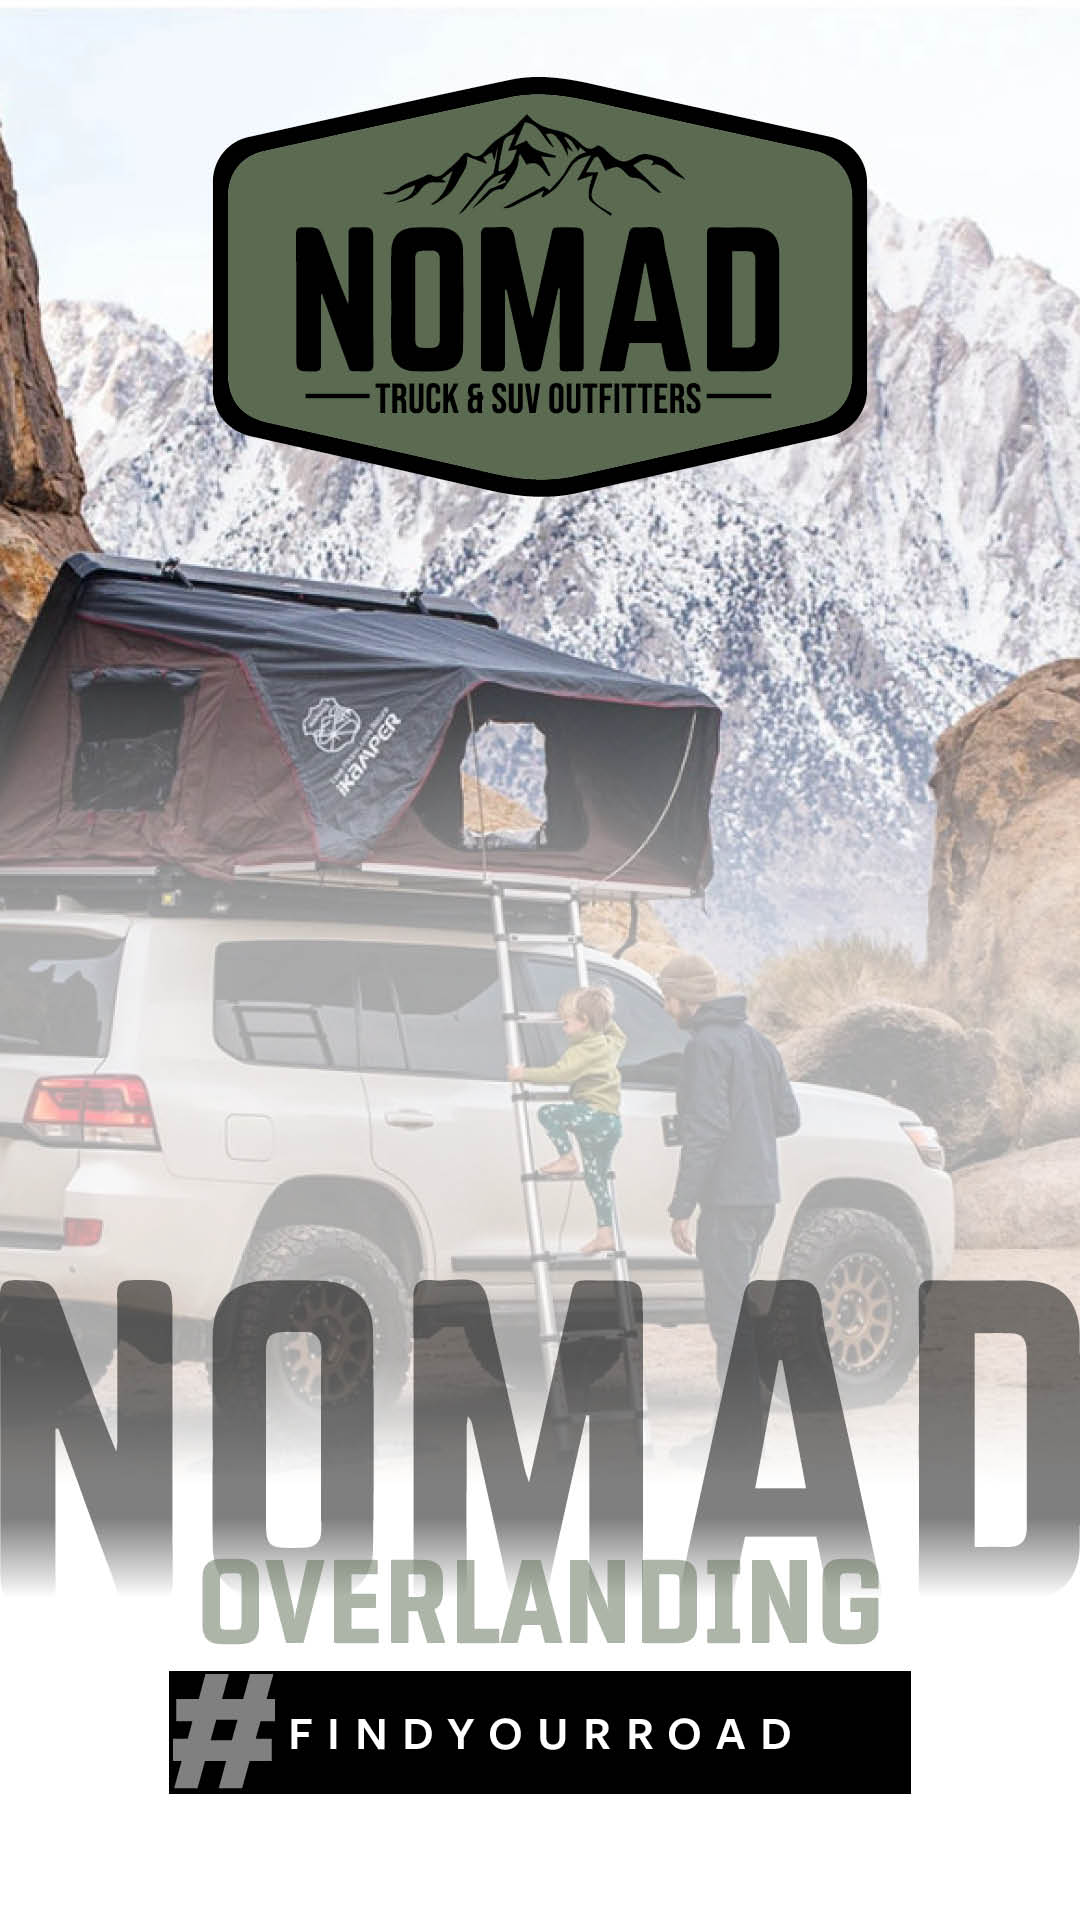 NOMAD_Overlanding